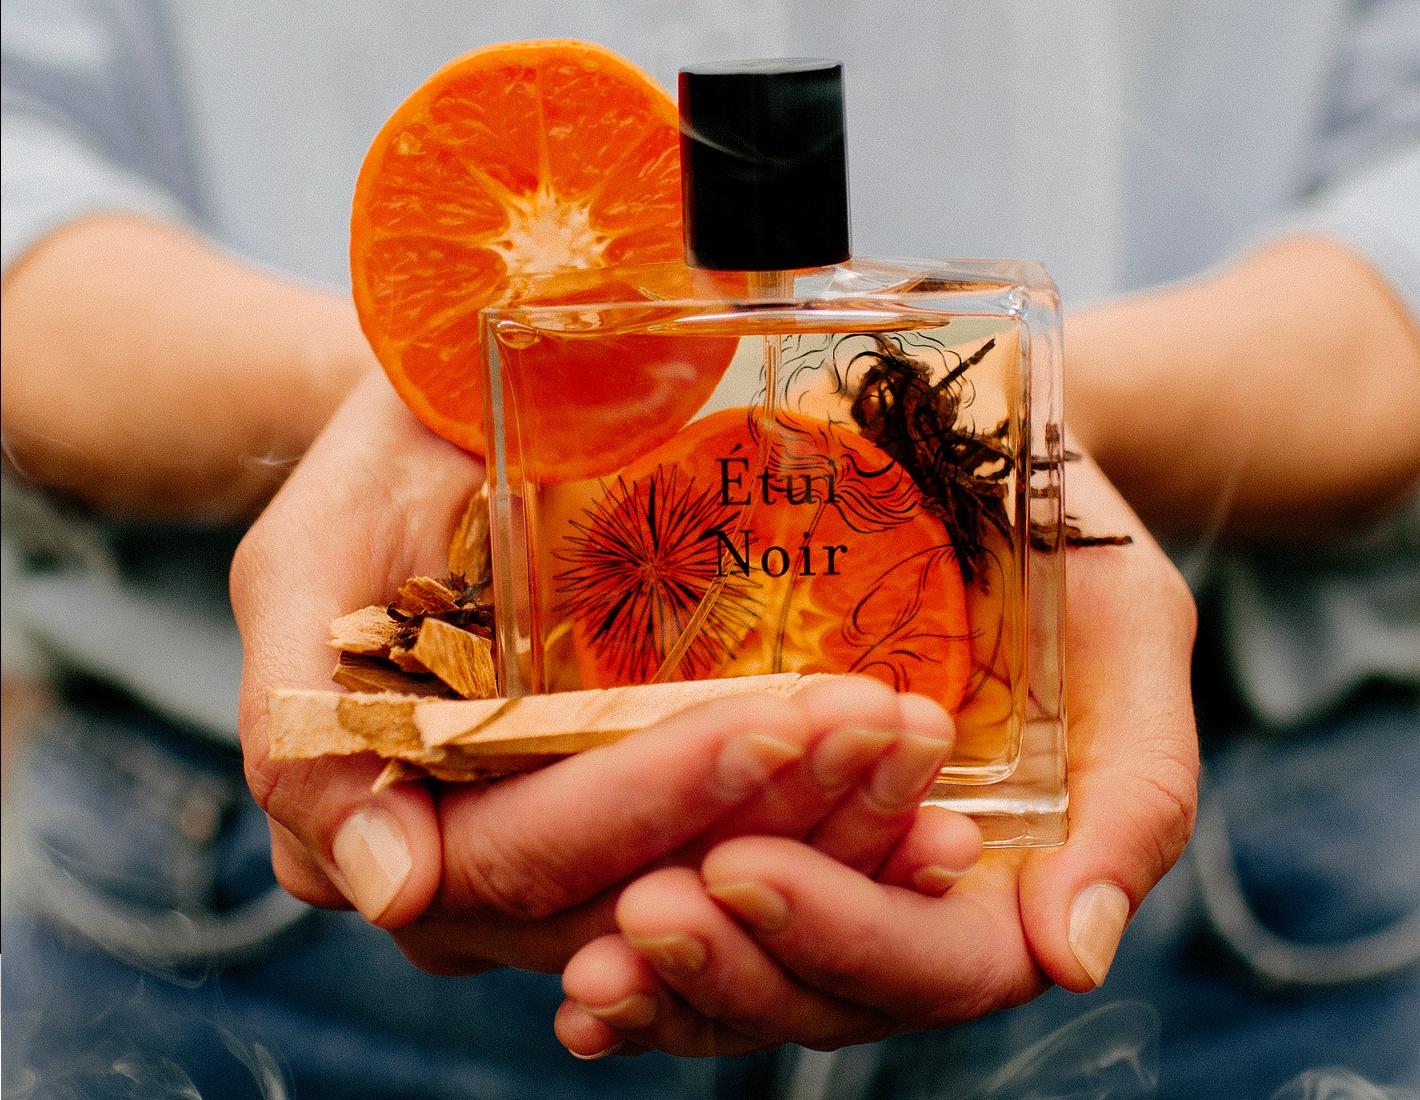 Étui Noir - An enthralling leather perfume by Miller Harris